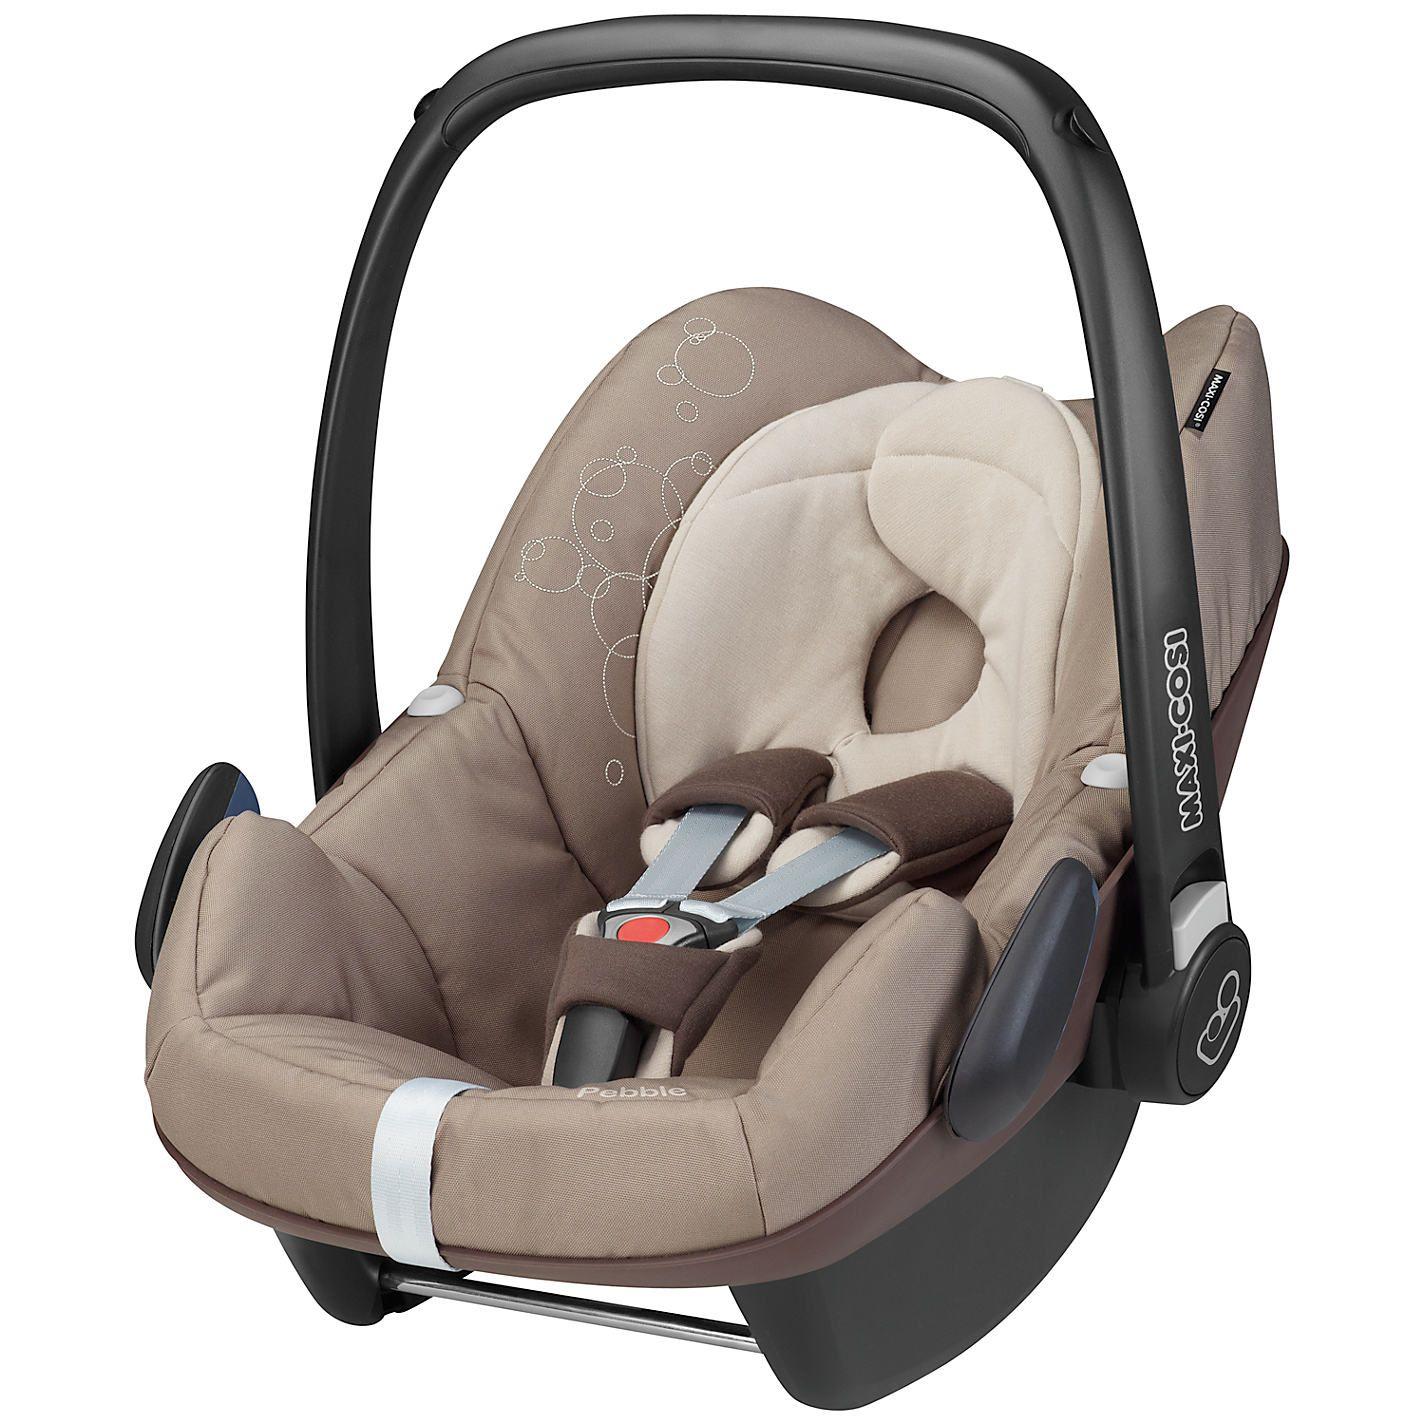 We love our Maxi Cosi Pebble car seat in Walnut Brown